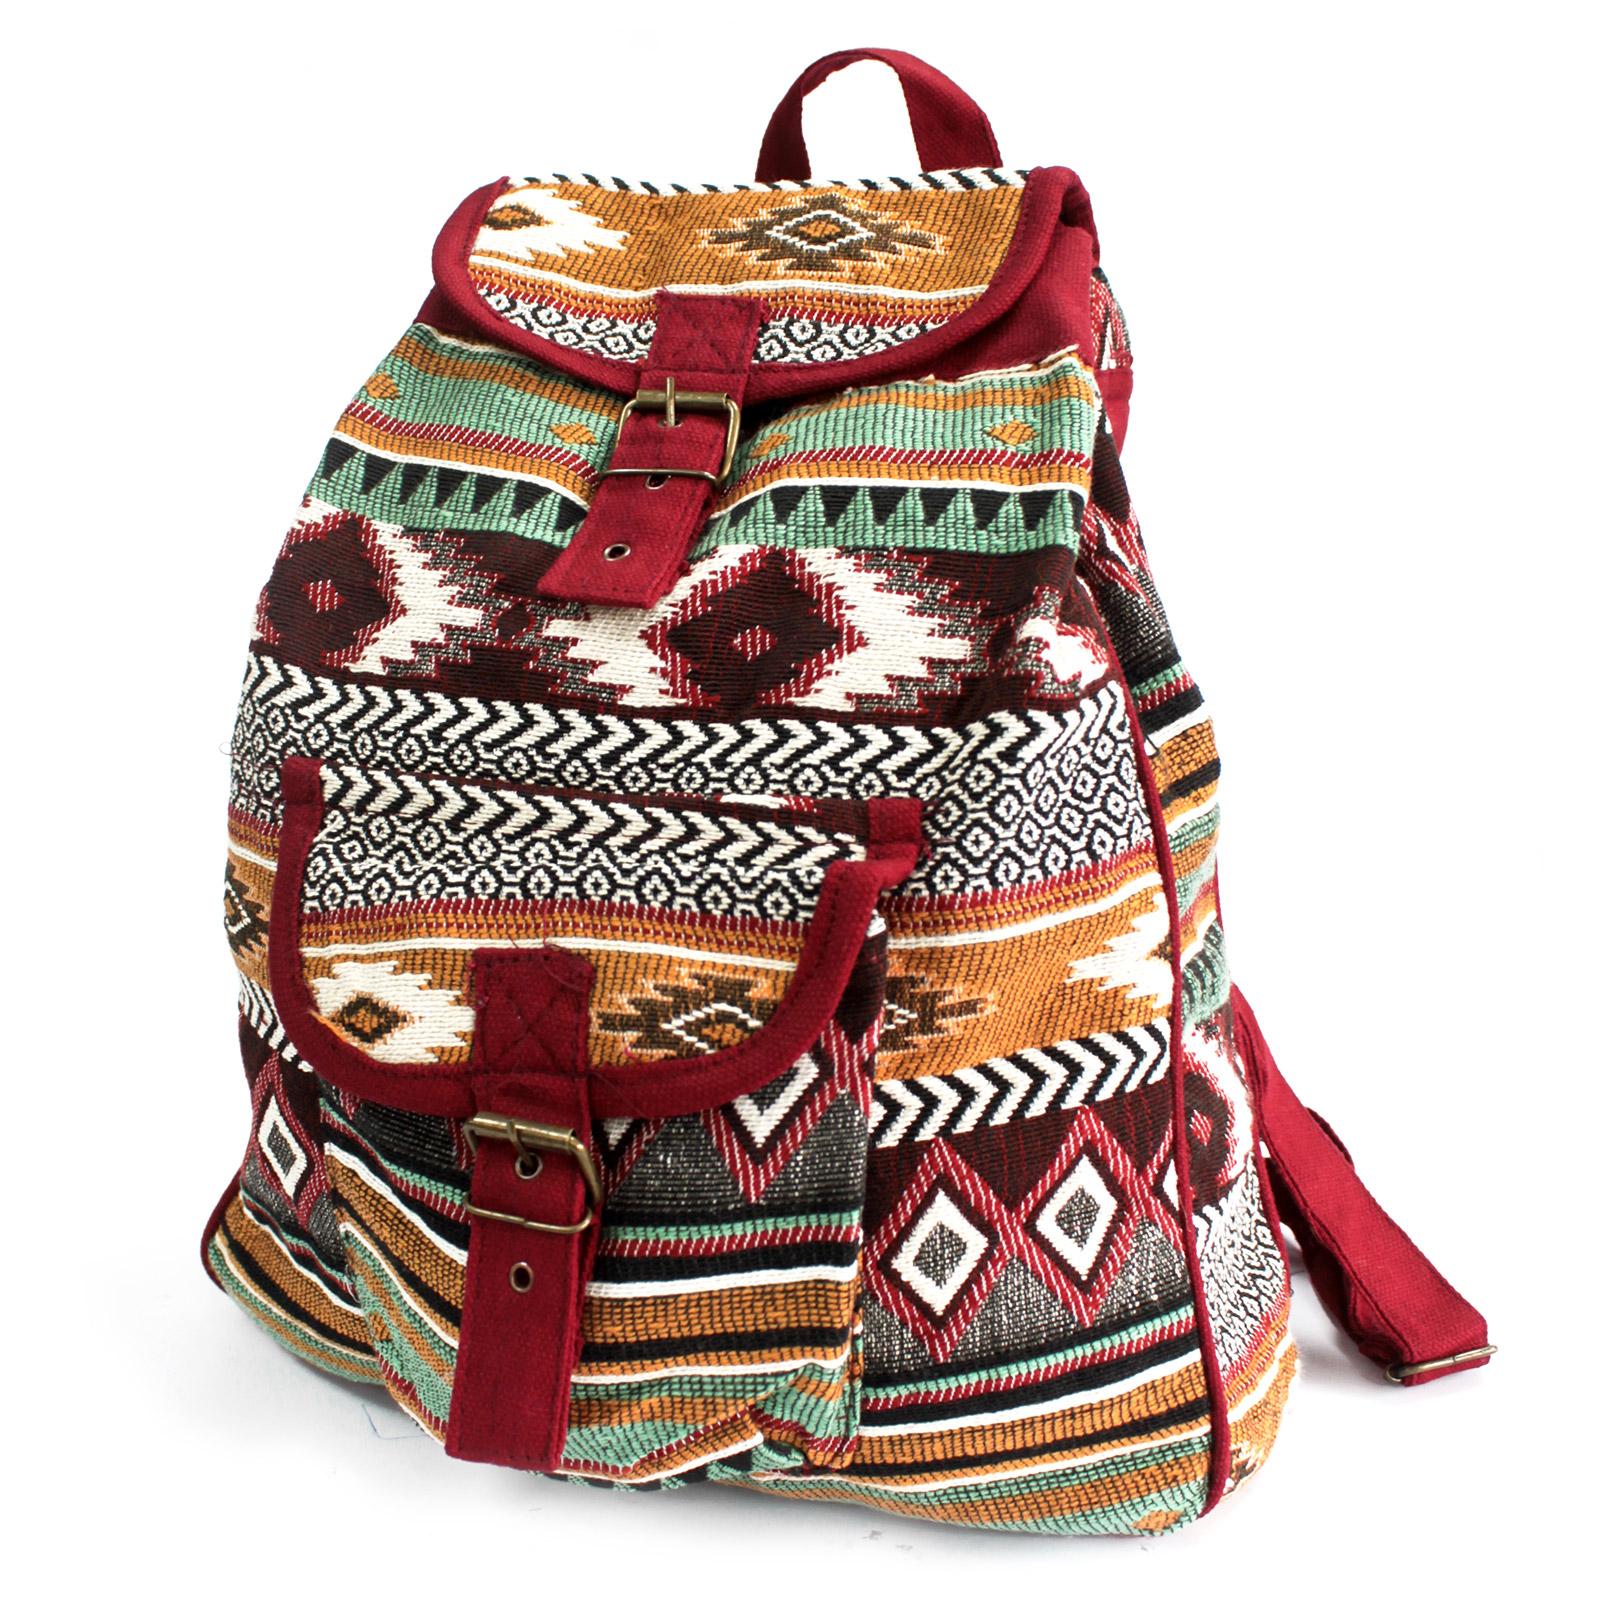 Jacquard Bag - Chocolate Backpack